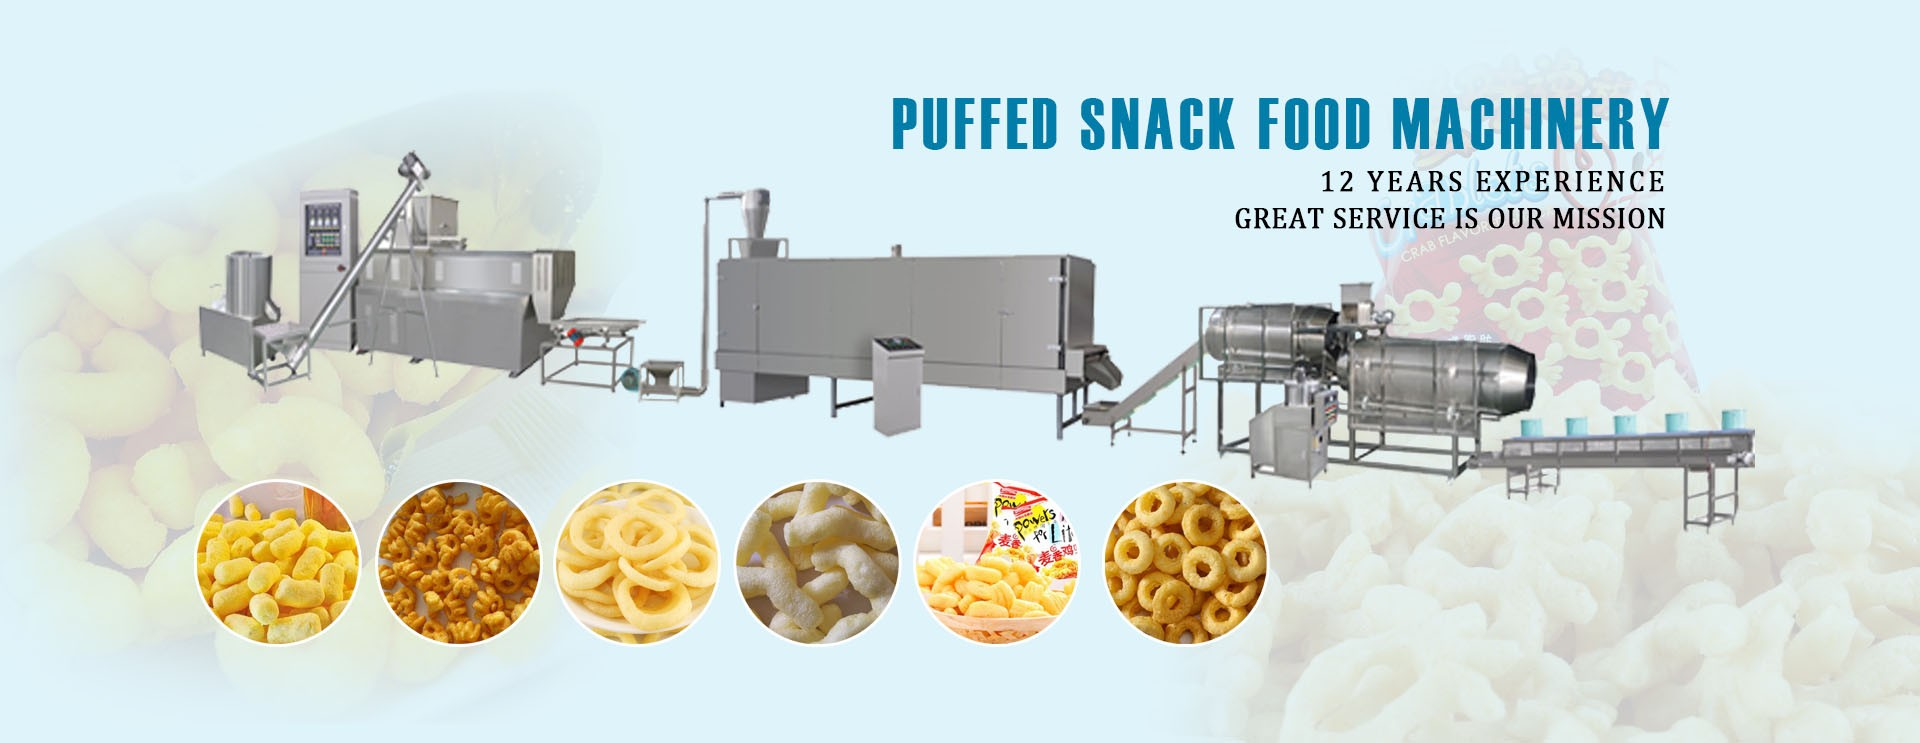 Snack Food Produktionslinie